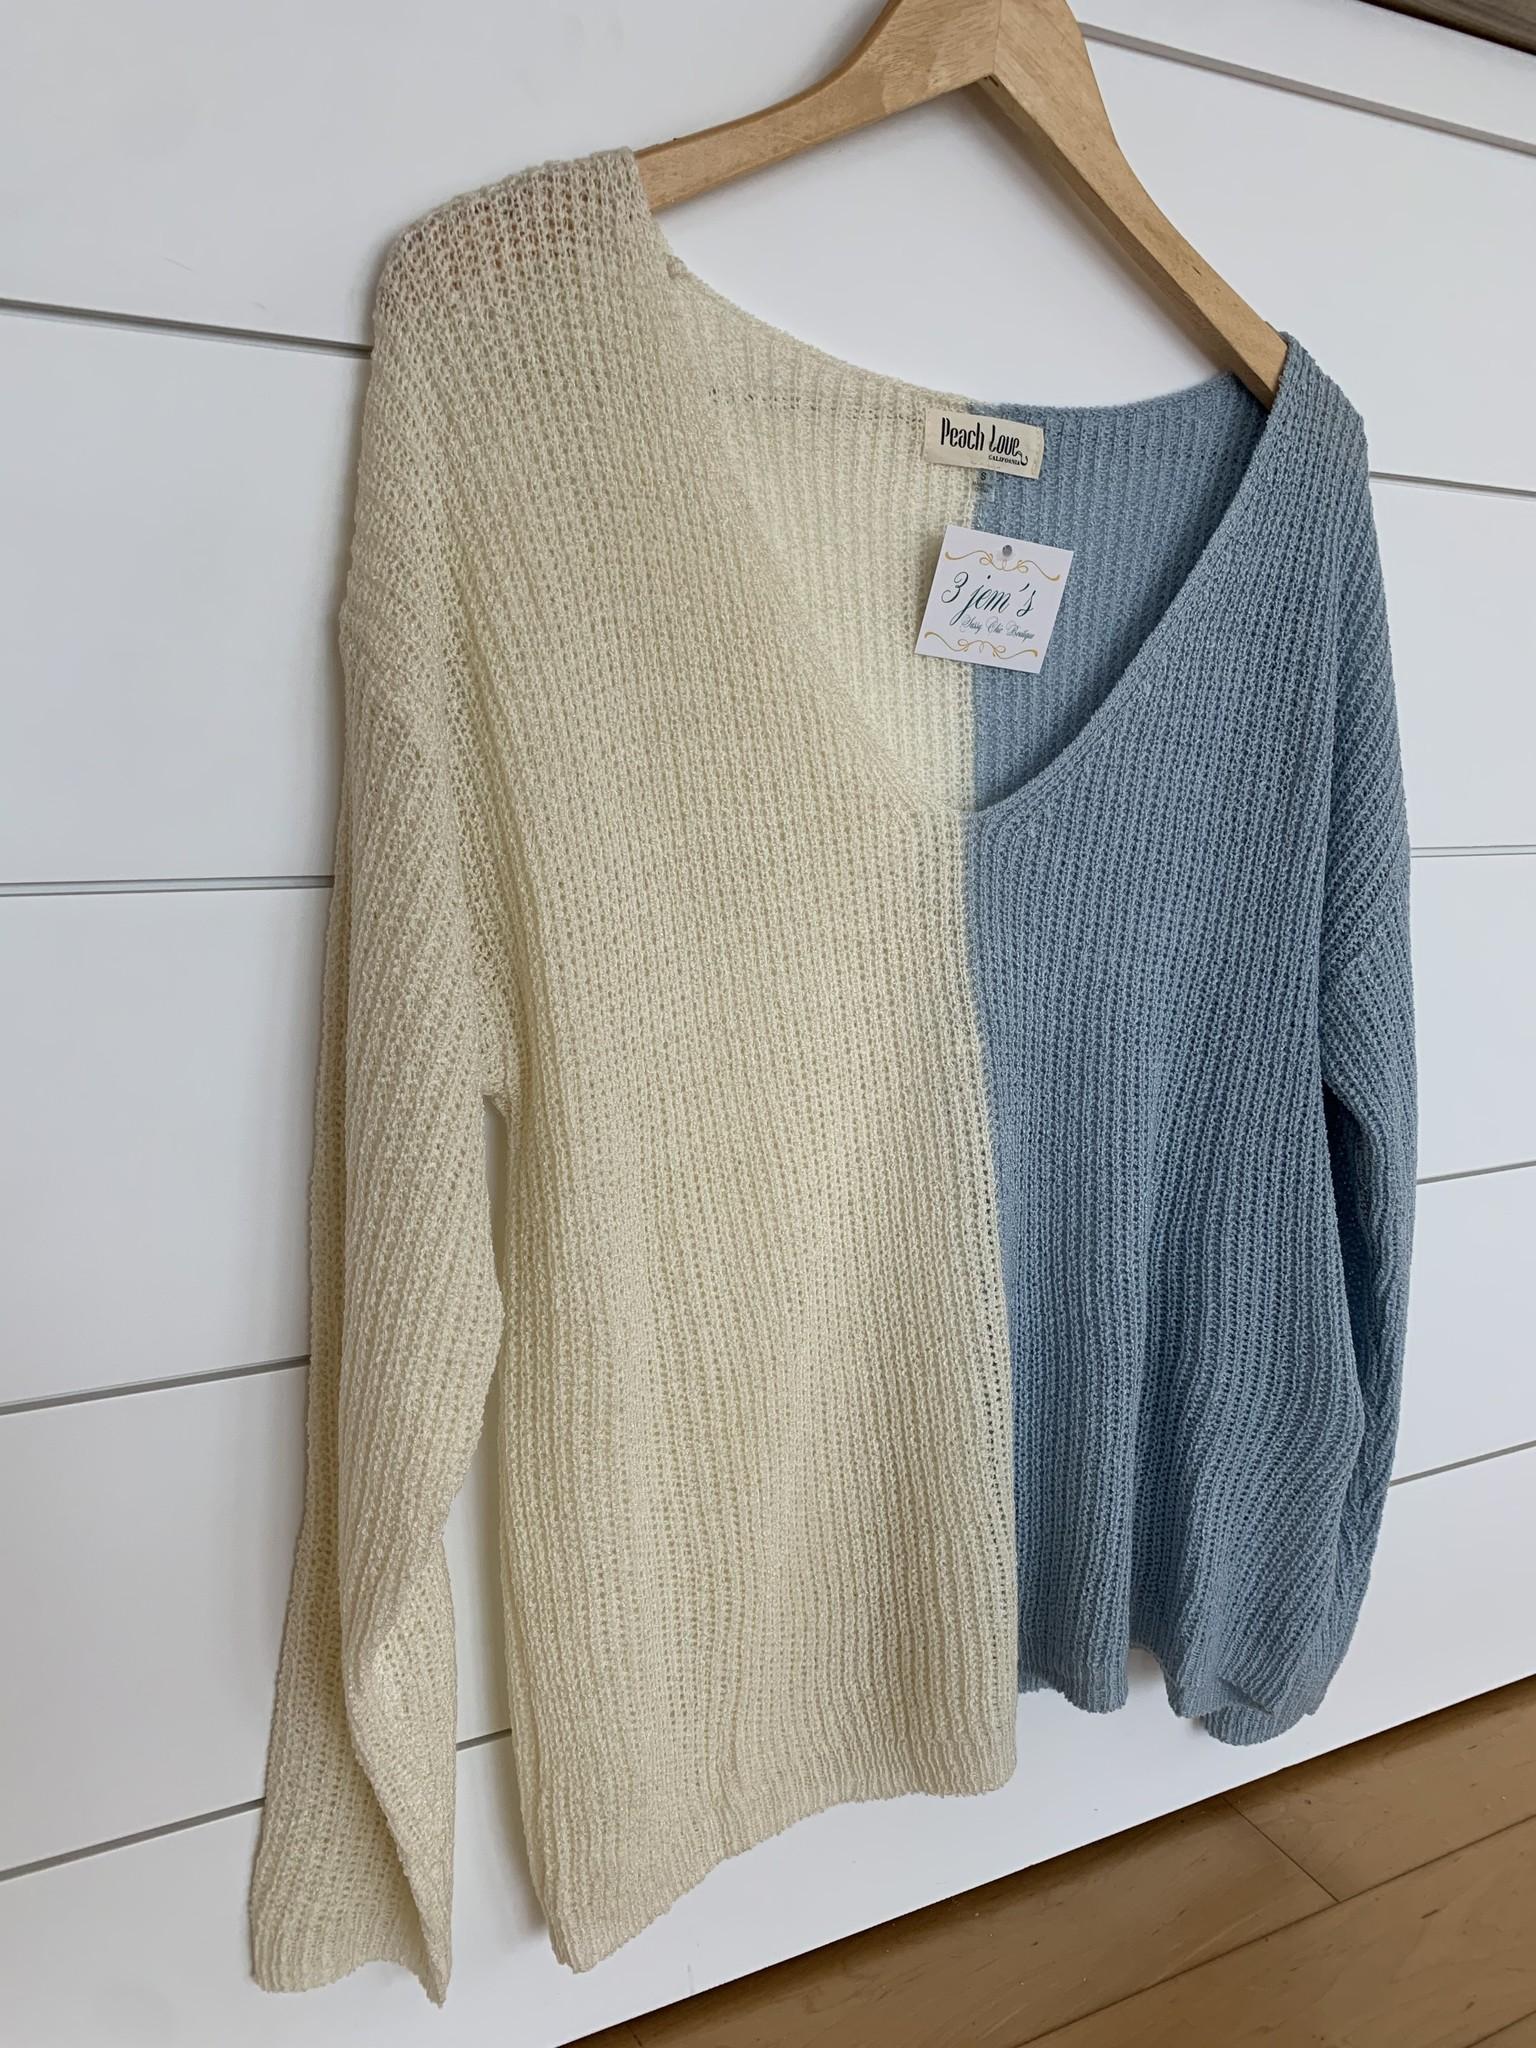 Ivory/Blue Color Block Lightweight Sweater